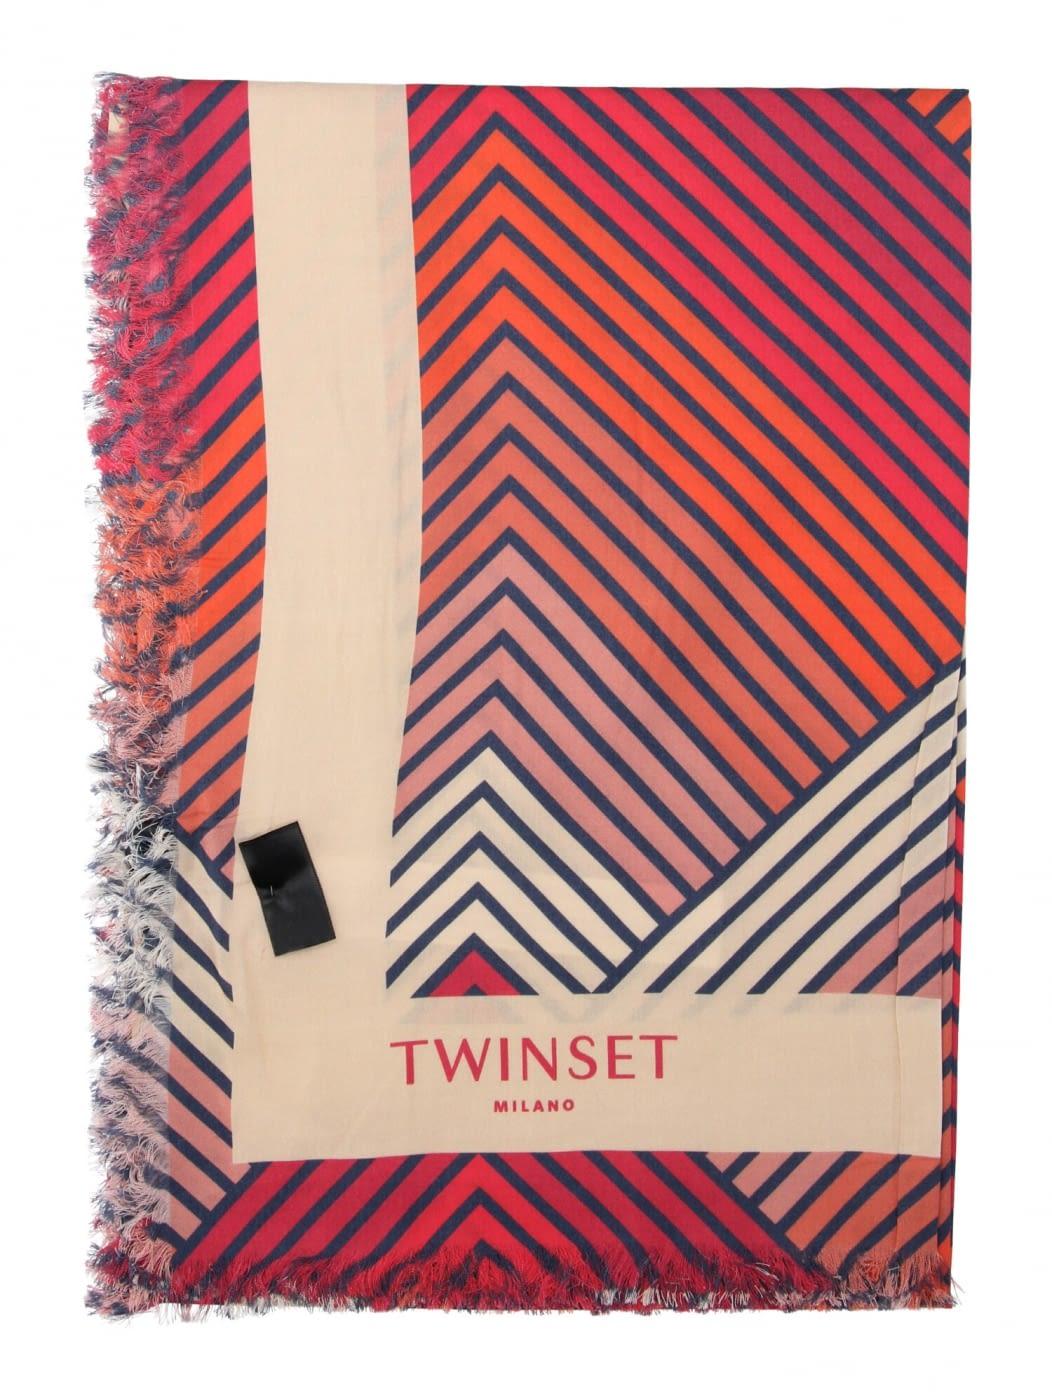 TWINSET pañuelo cuadrado estampado geométrico rojo